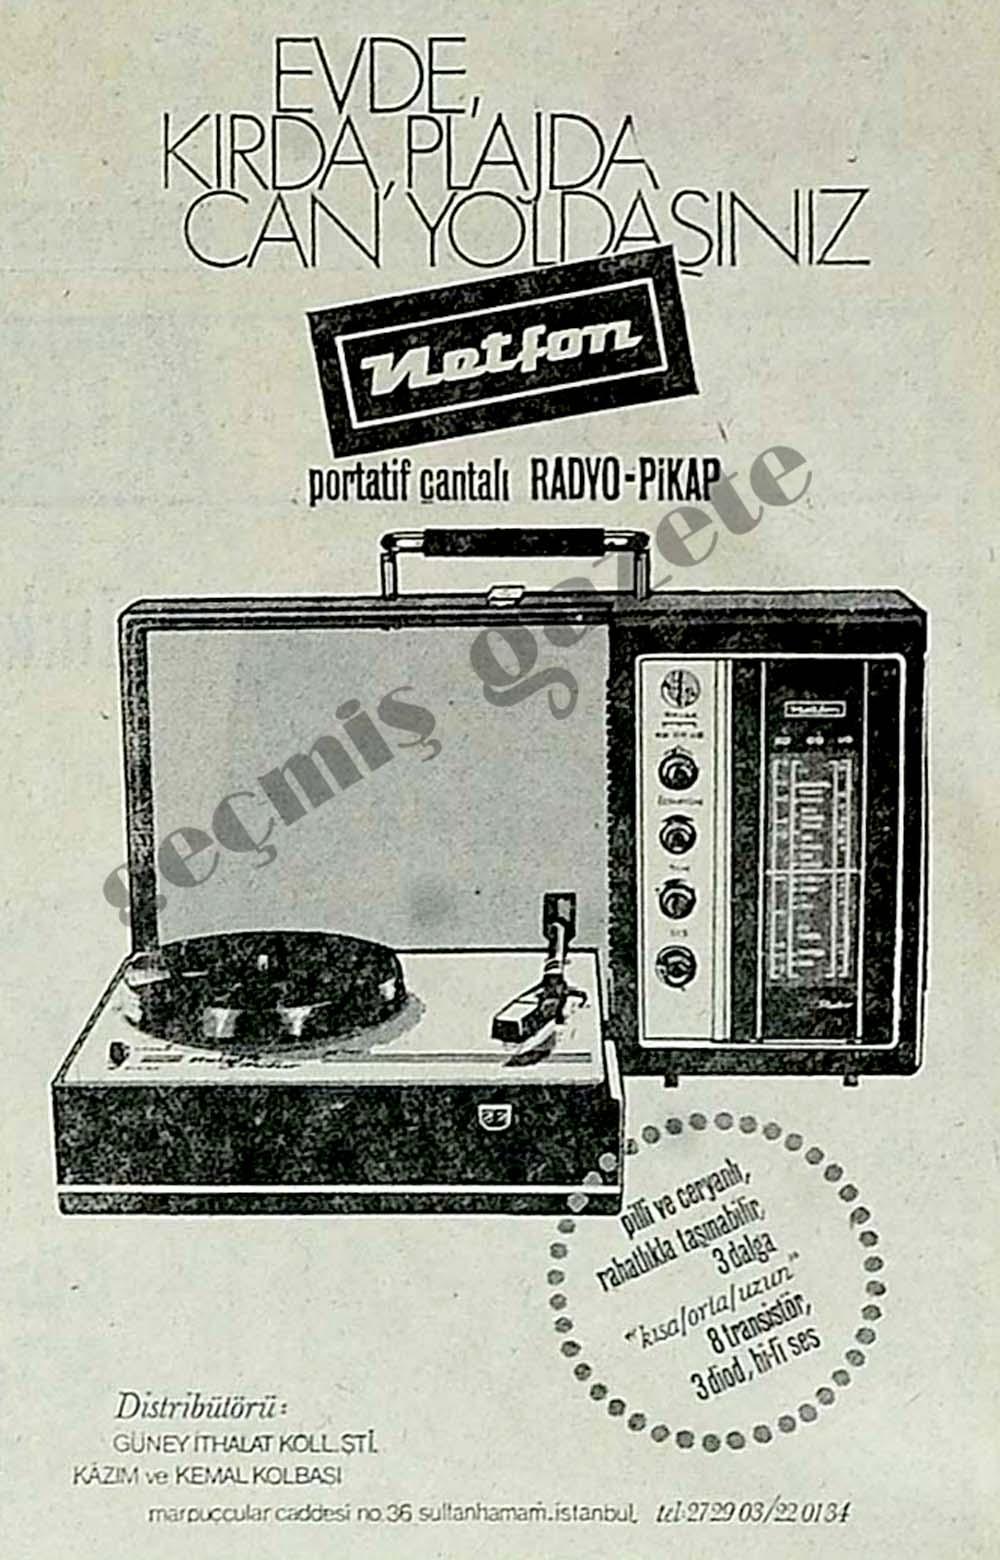 Evde, kırda, plajda can yoldaşınız Netfon portatif çantalı Radyo-Pikap